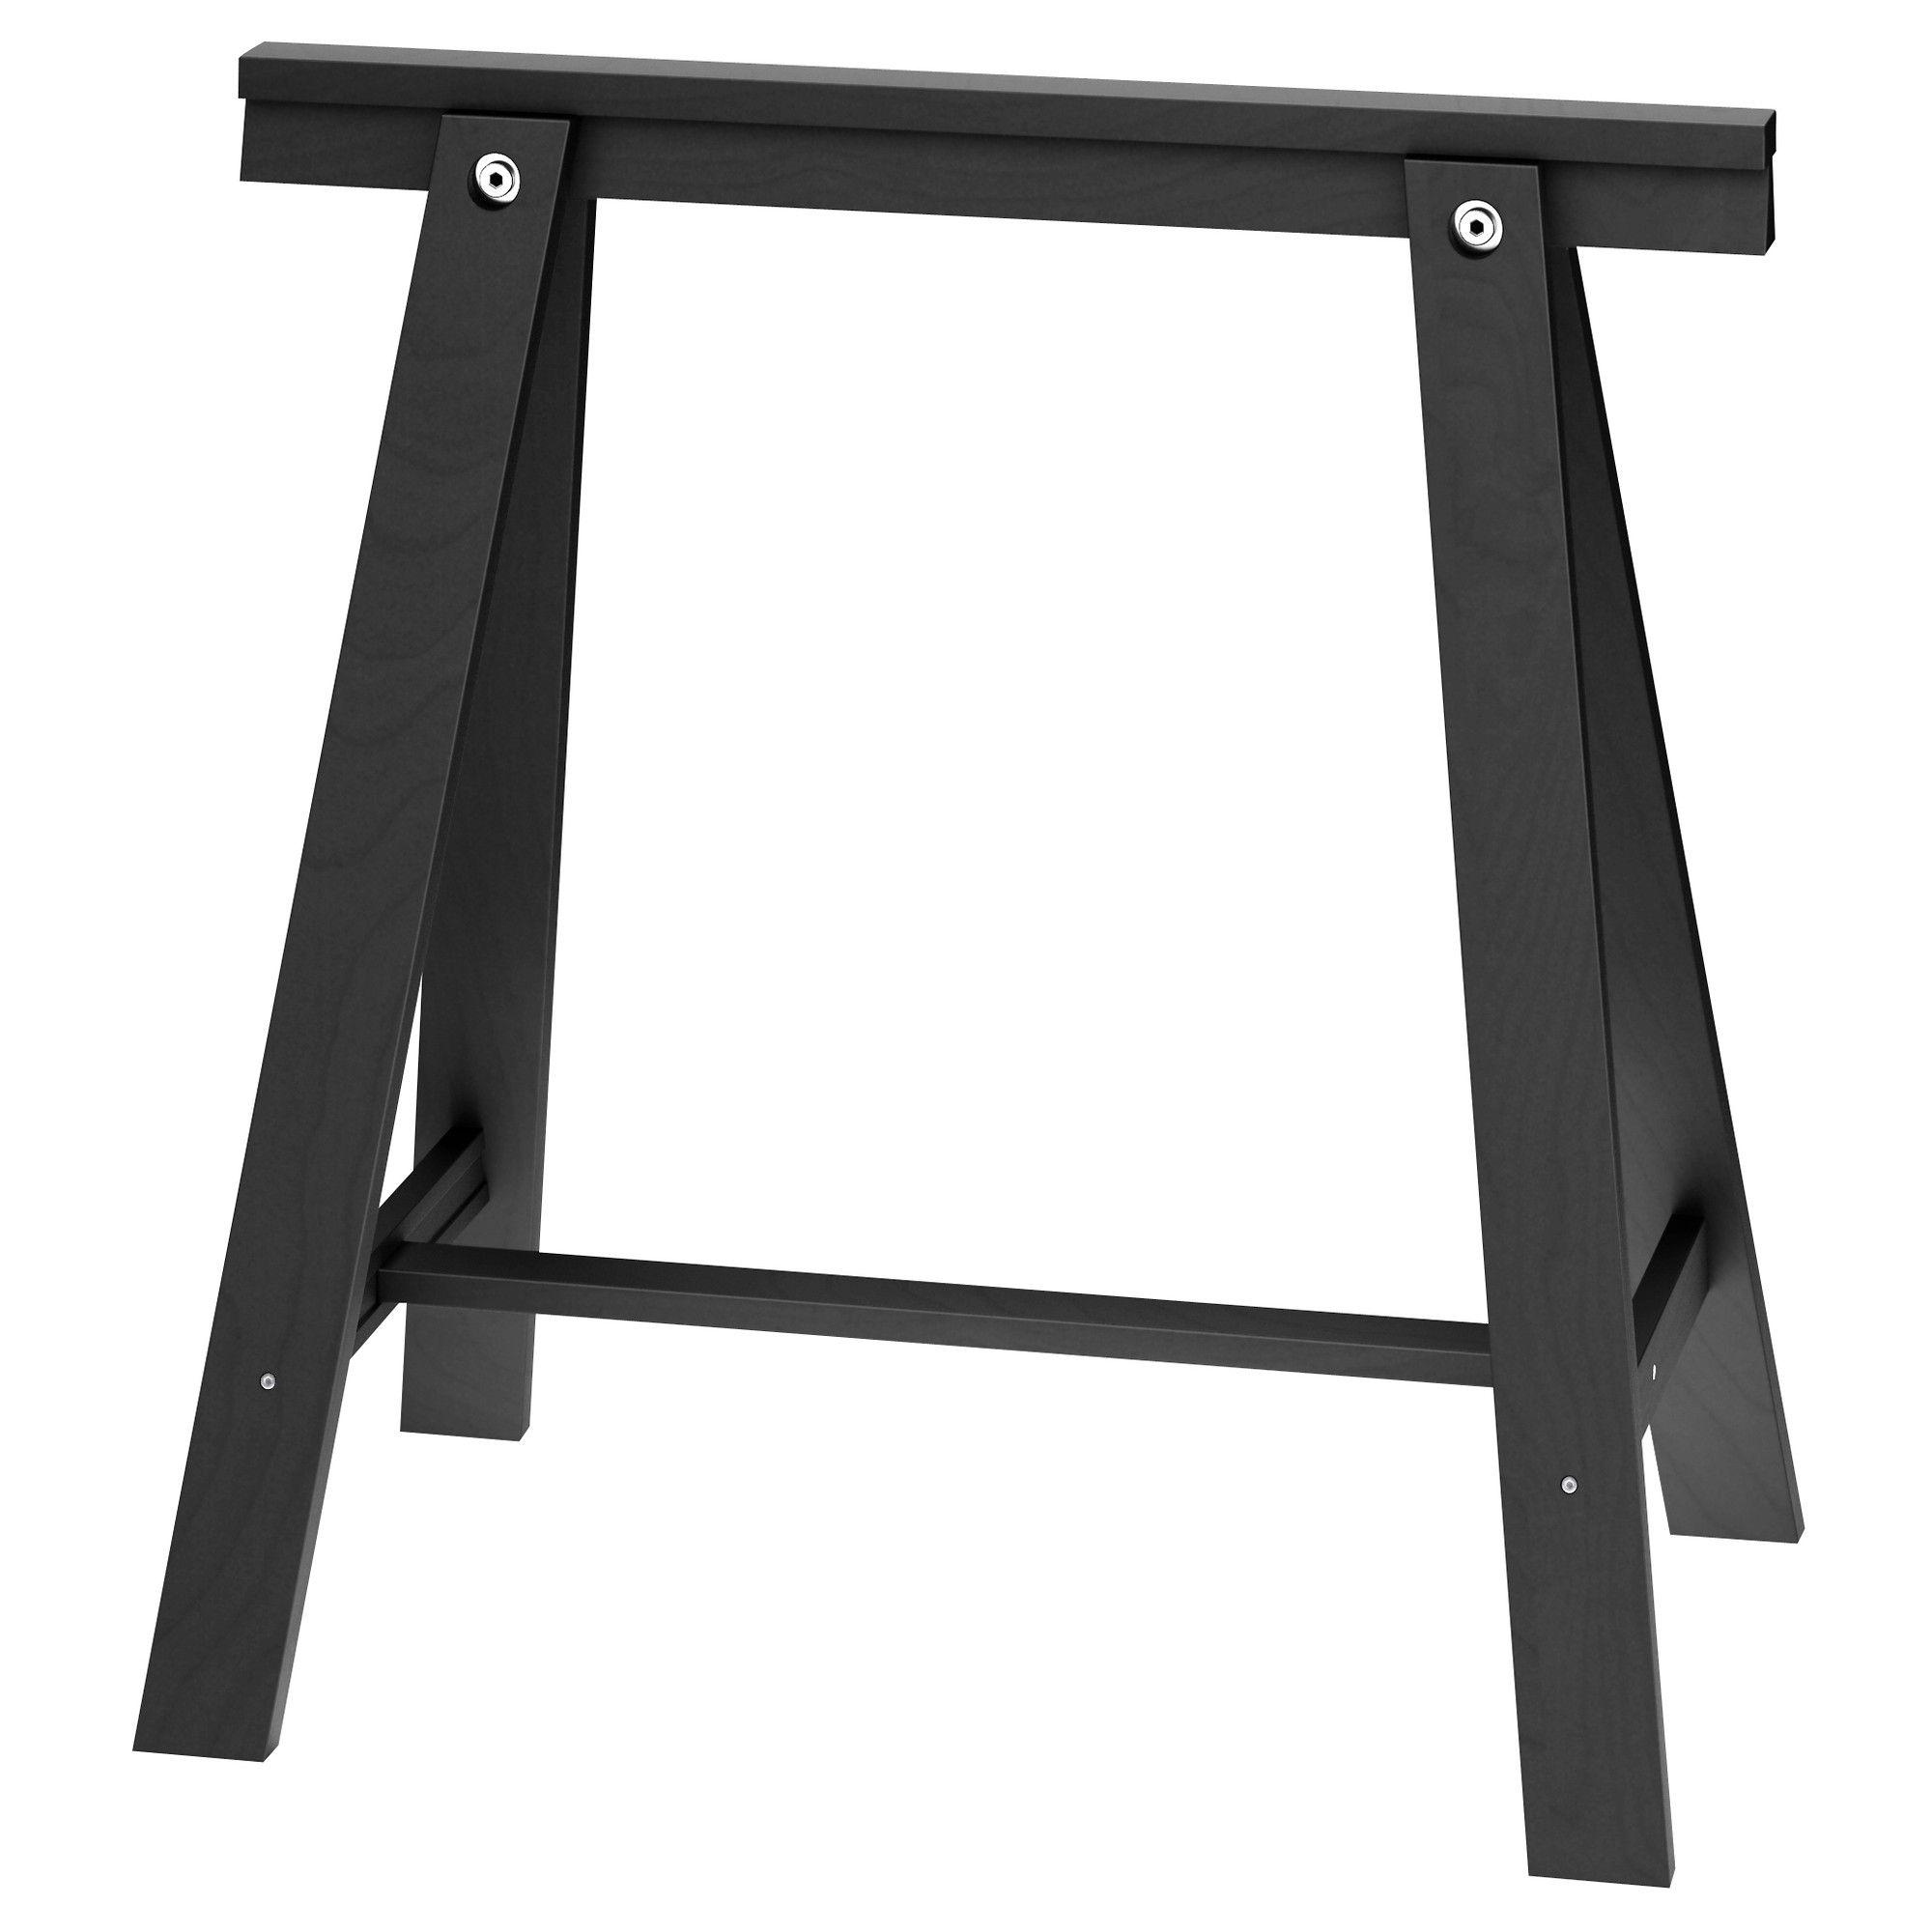 Oddvald caballete negro muebles para exterior muebles for Muebles de oficina kennedy